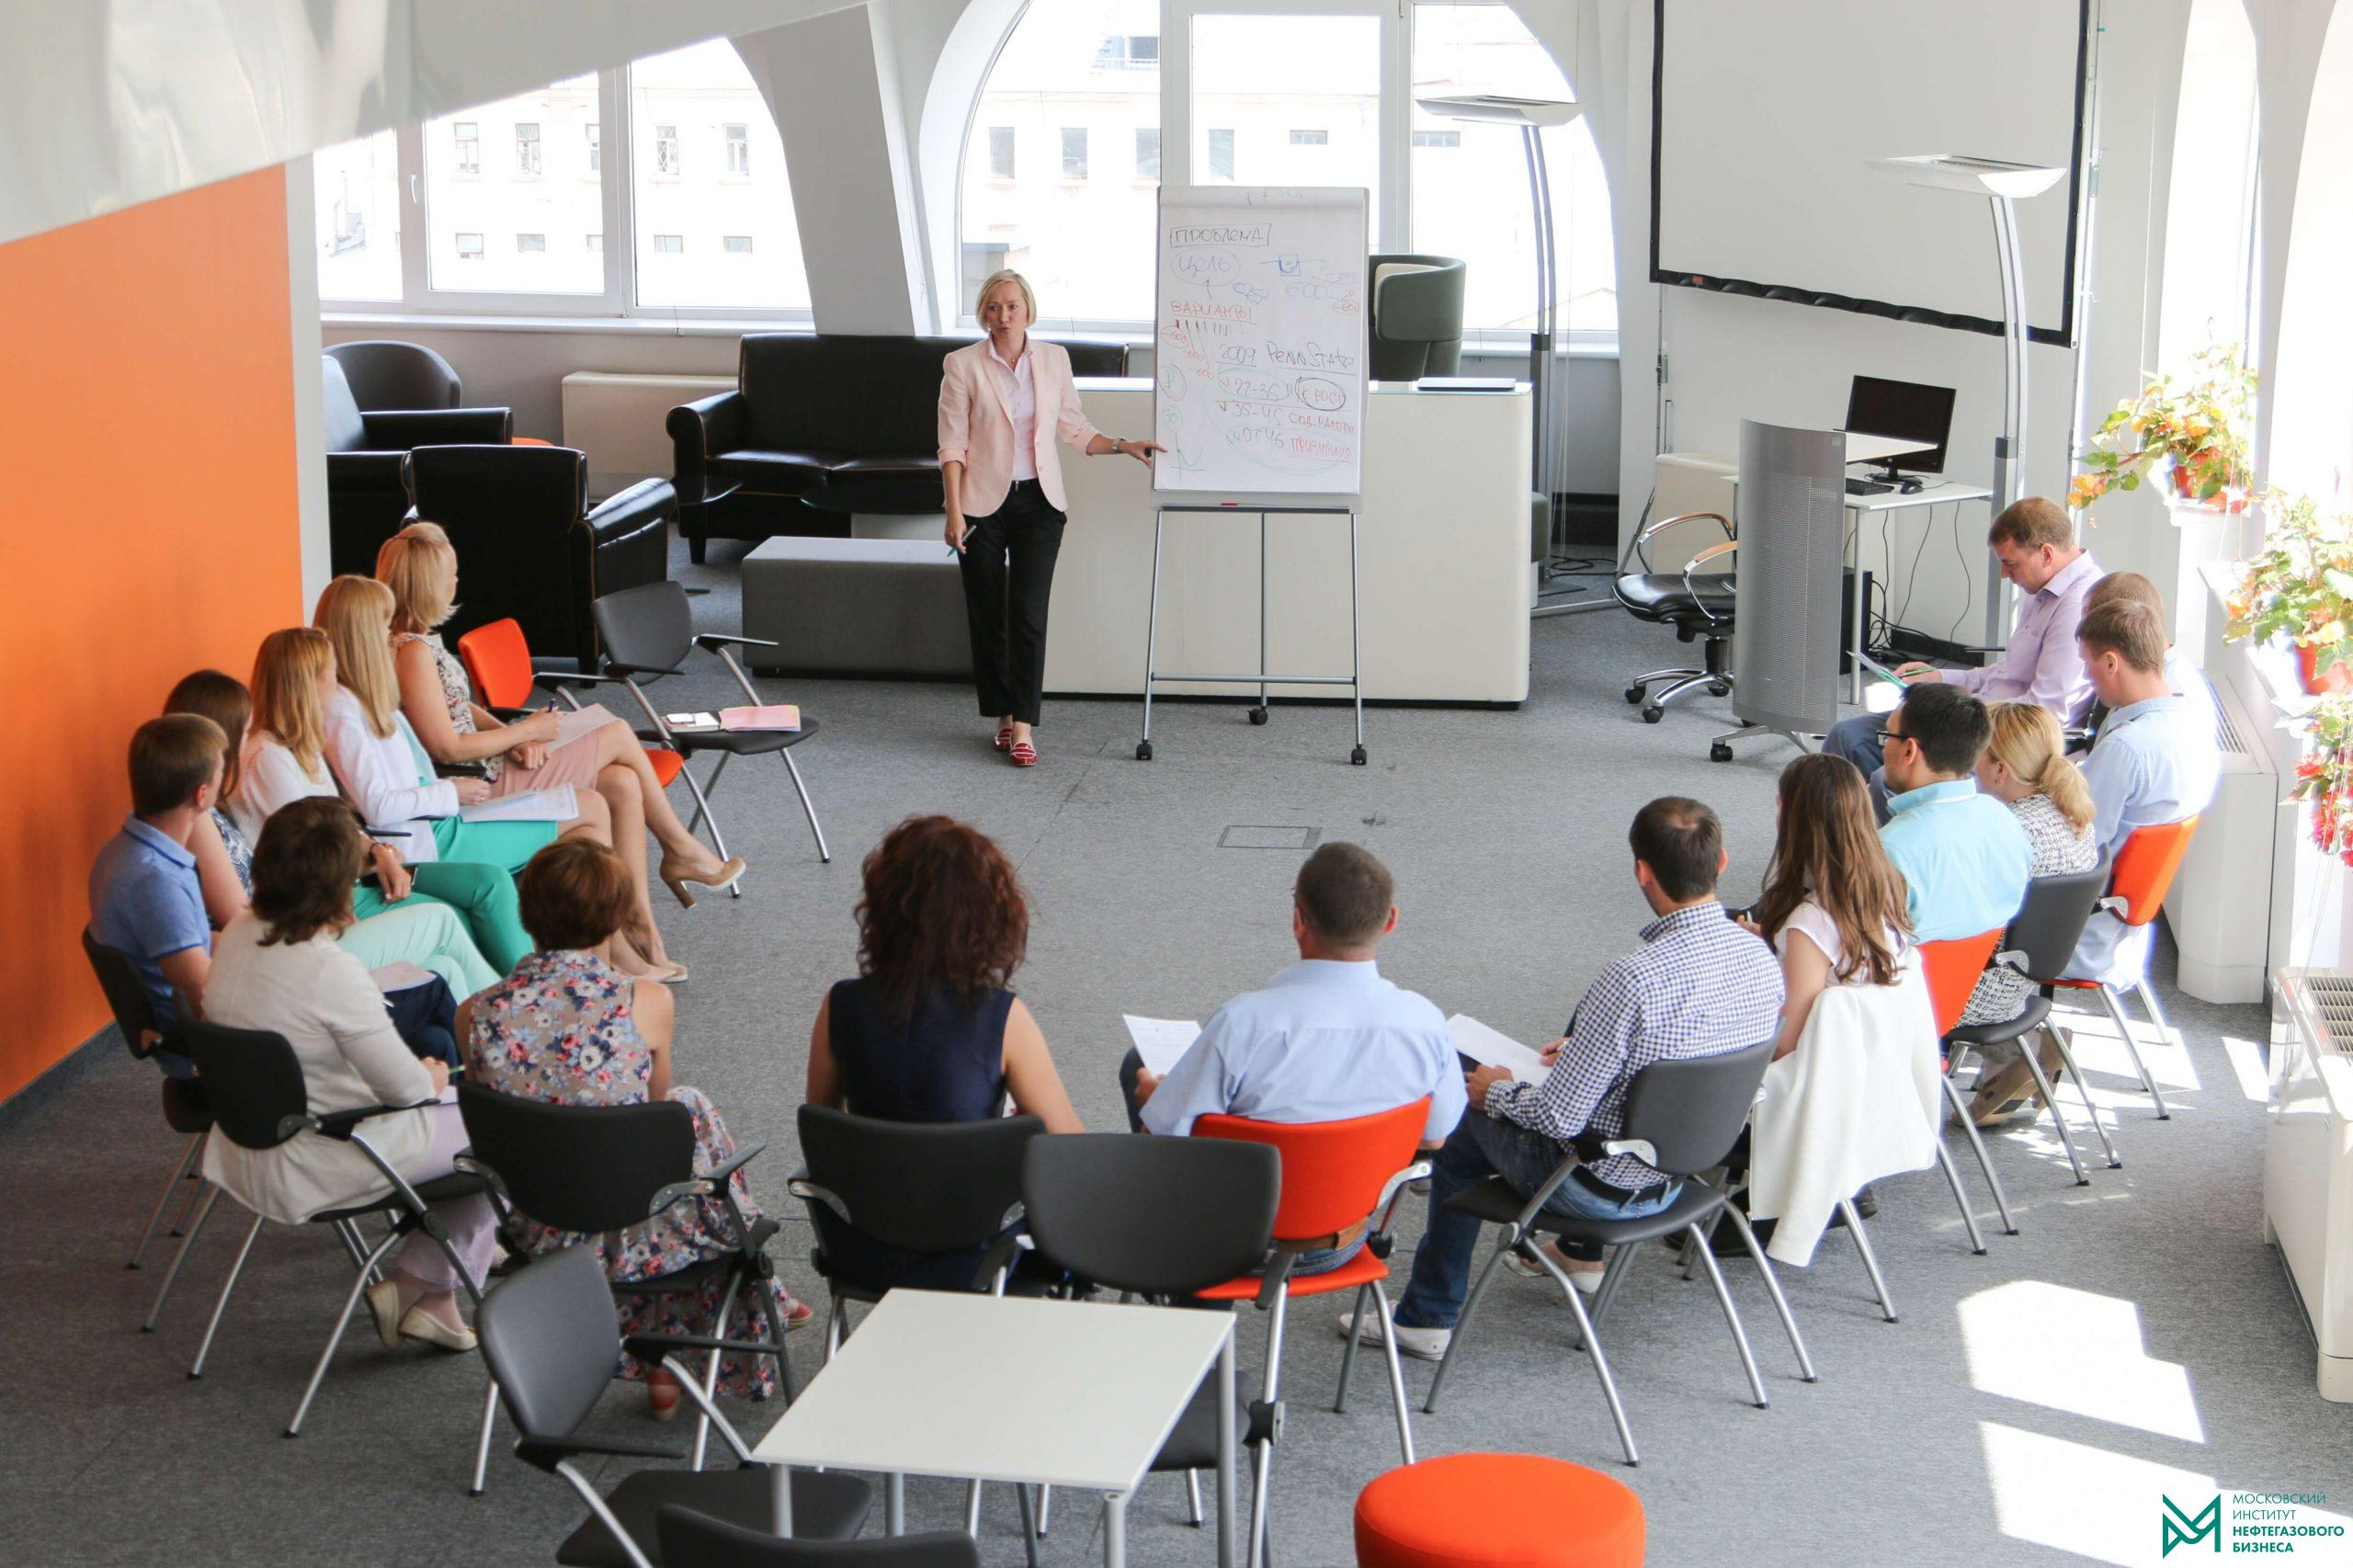 Программа MBA: Нефтяной и газовый бизнес, Сургутнефтегаз